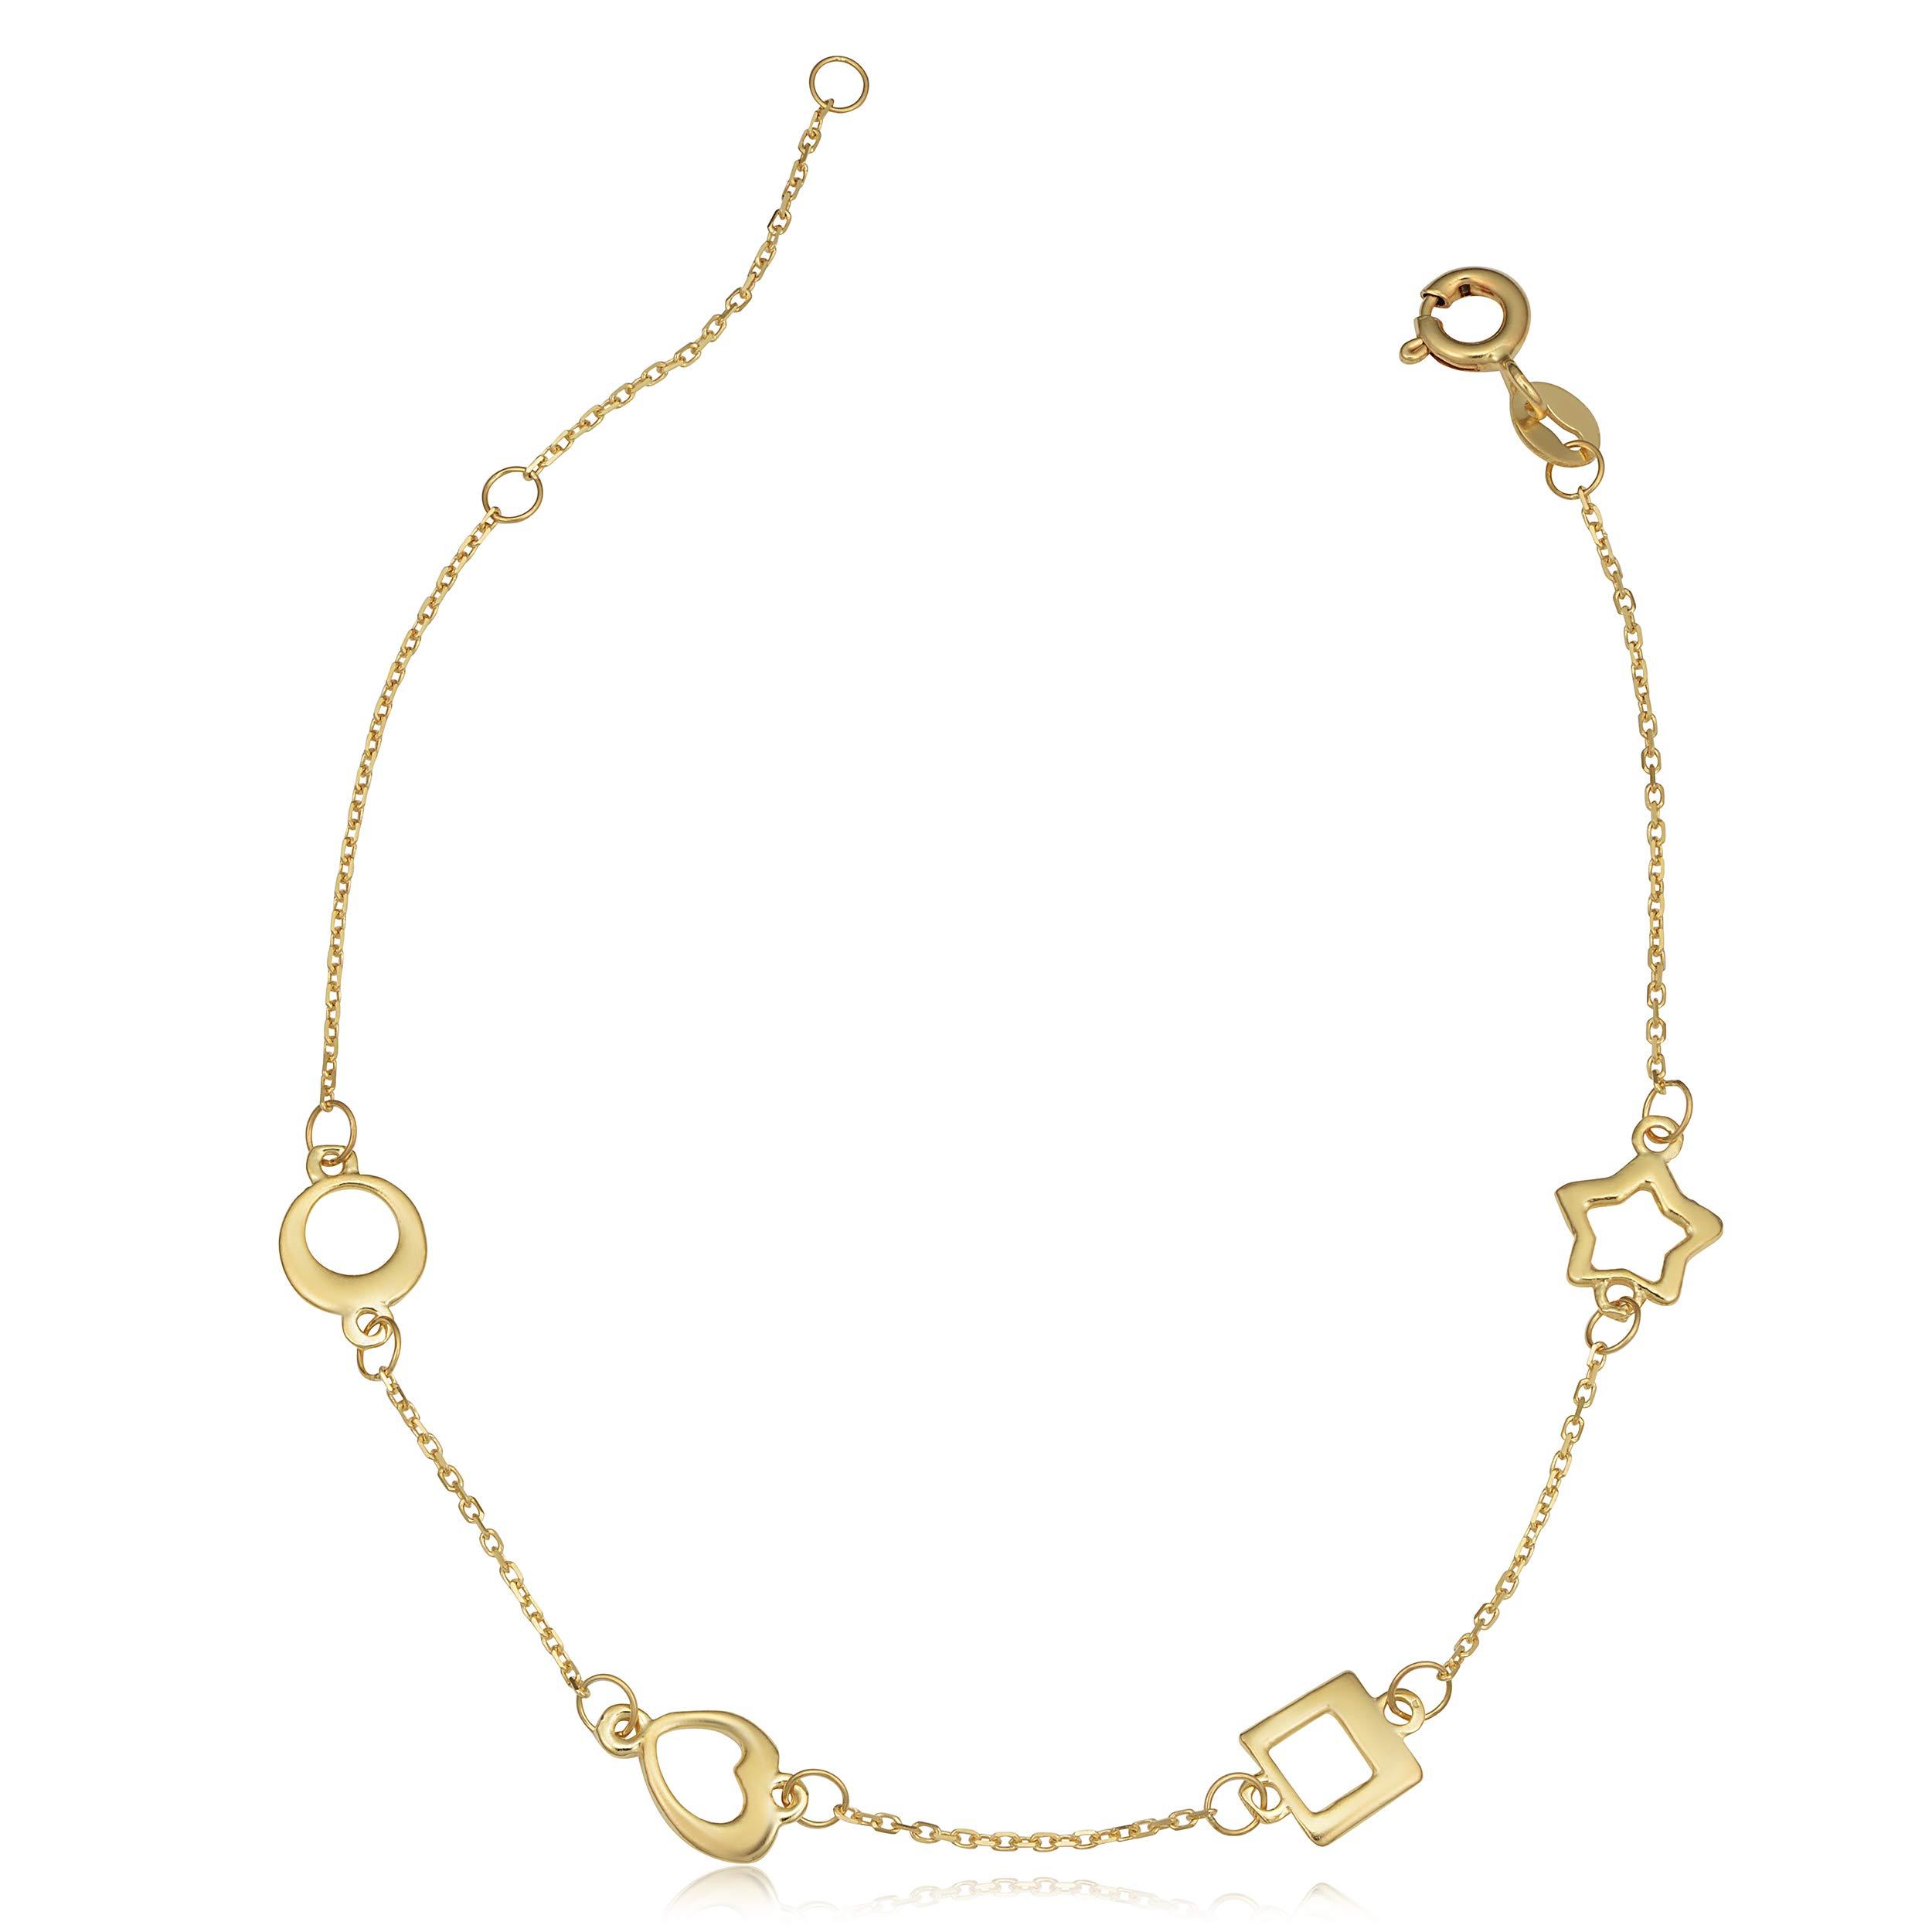 Kooljewelry 14k Yellow Gold Circle Heart Square Star Station Bracelet (adjusts to 6.5 or 7.5 inch) by Kooljewelry